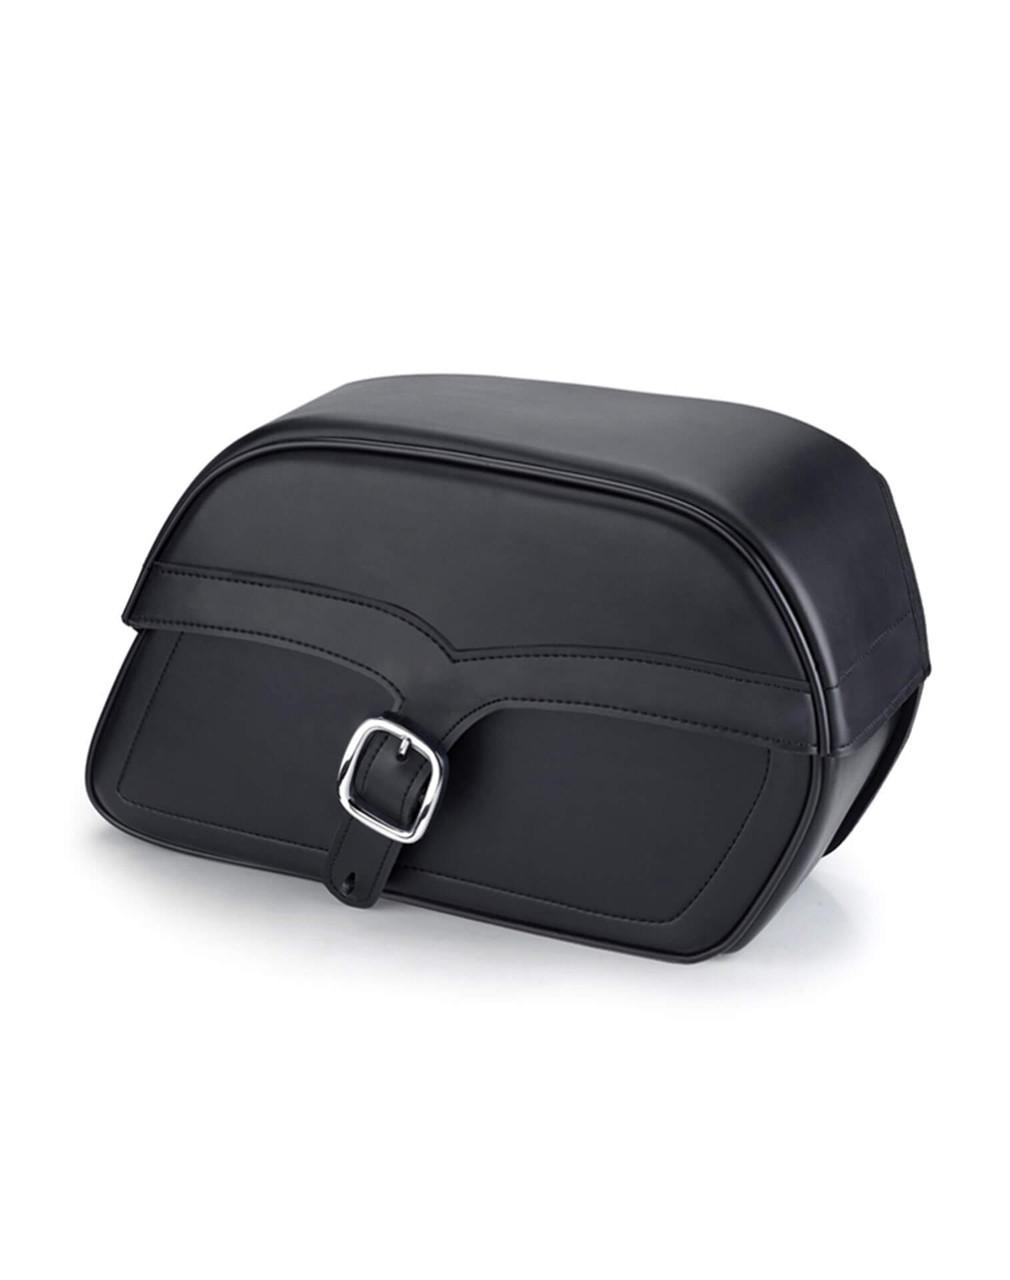 Honda VTX 1800 N SS Slanted M Motorcycle Saddlebags Main Bag View